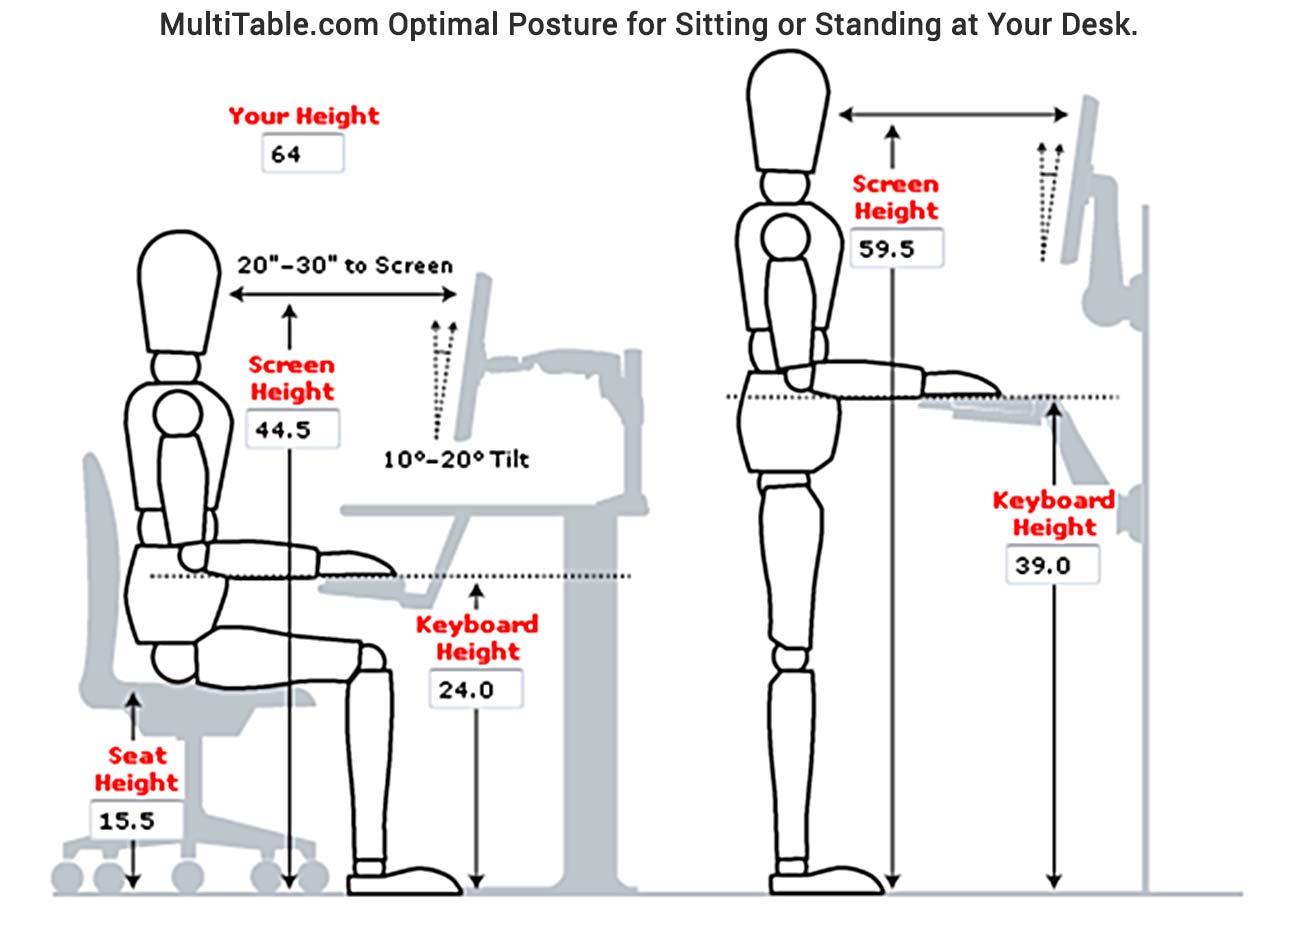 Ideal Standing Desk Posture Ergonomics MultiTable.com